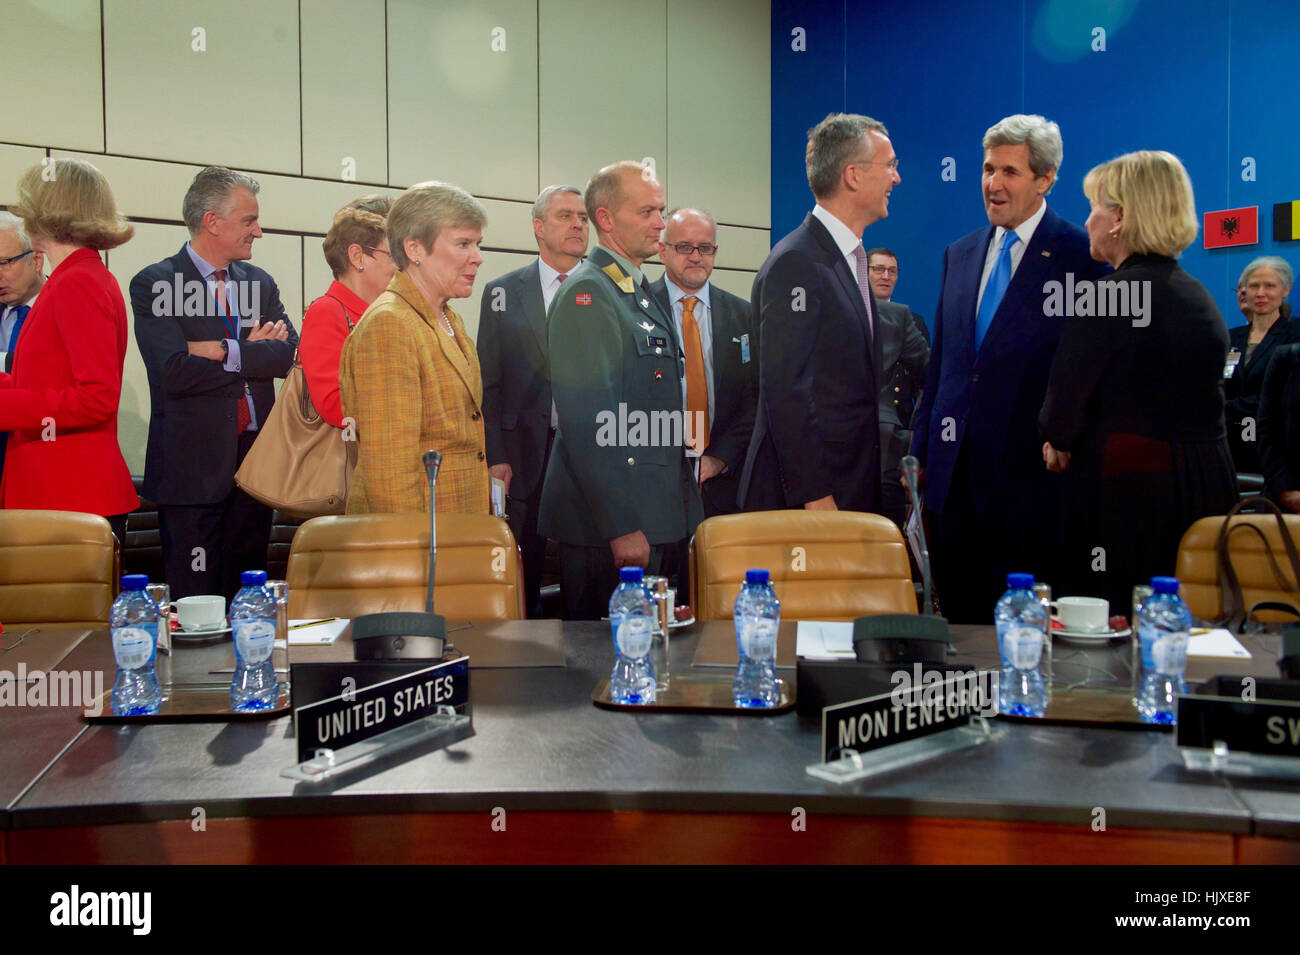 U.S. Secretary of State John Kerry chats with North Atlantic Treaty Organization Secretary-General Jens Stoltenberg Stock Photo